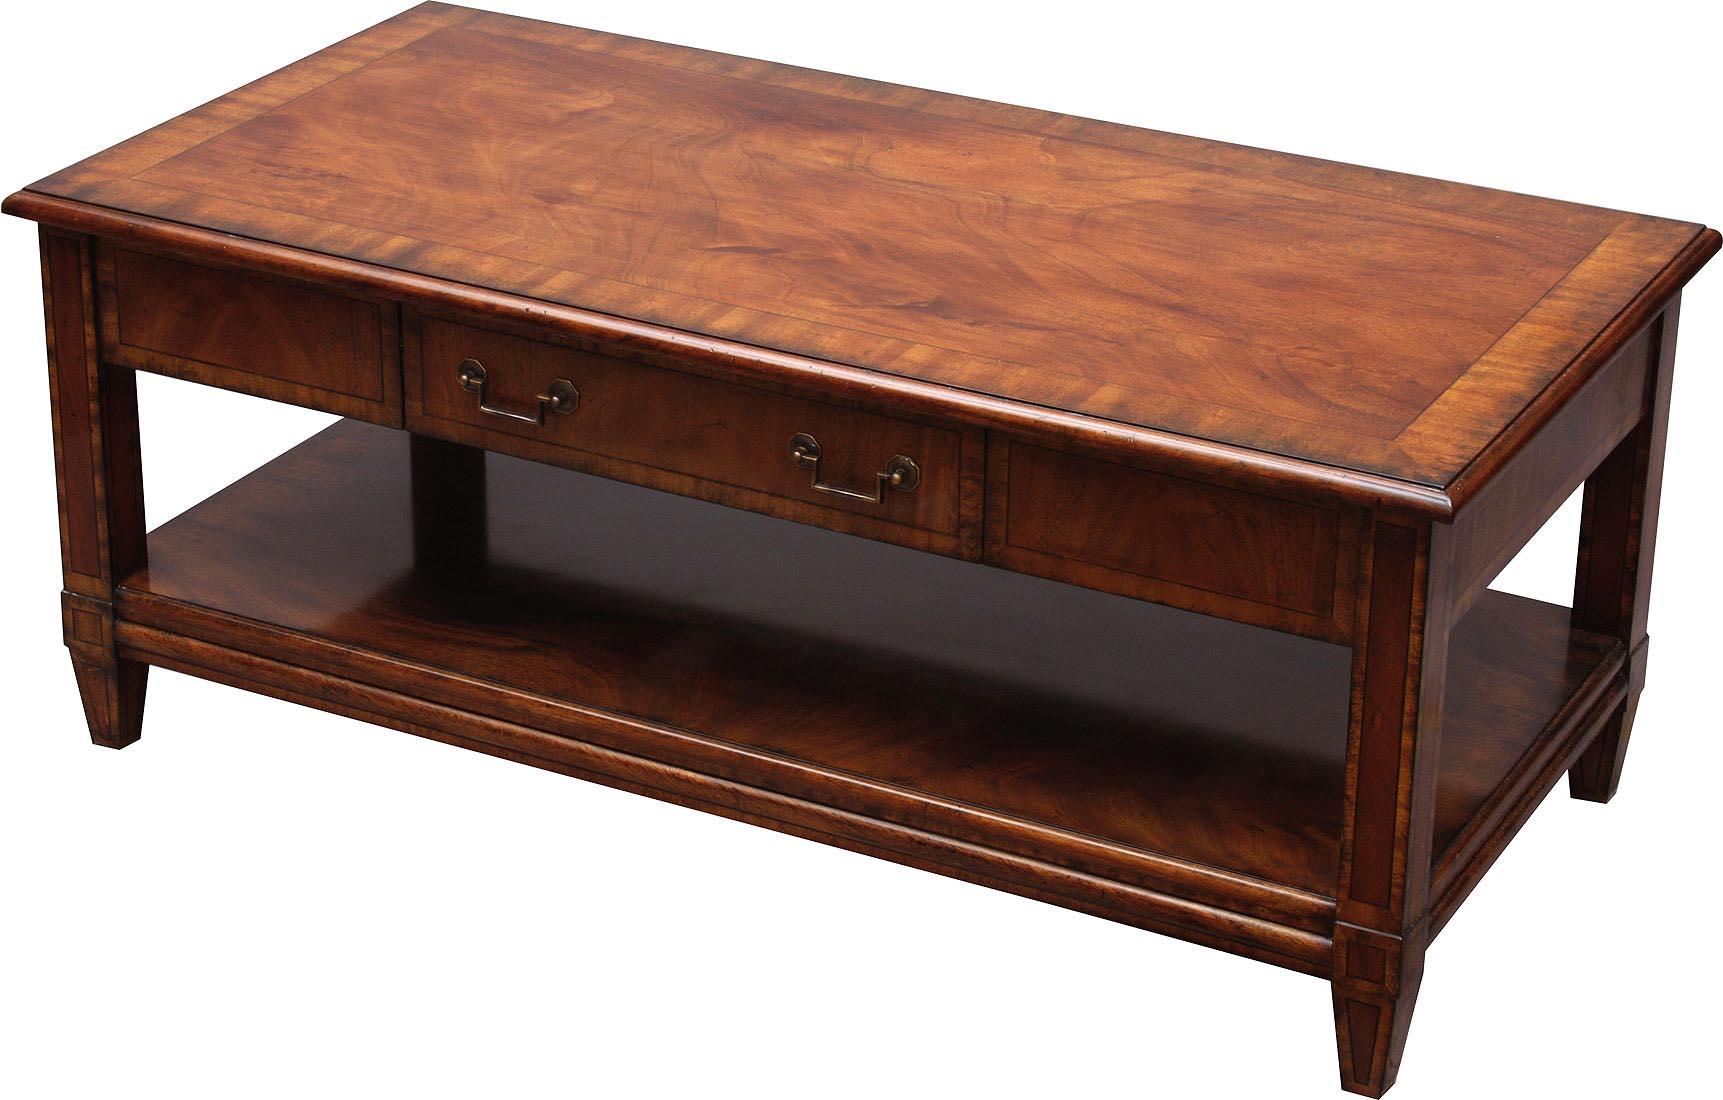 Mahogany Coffee Table Antique